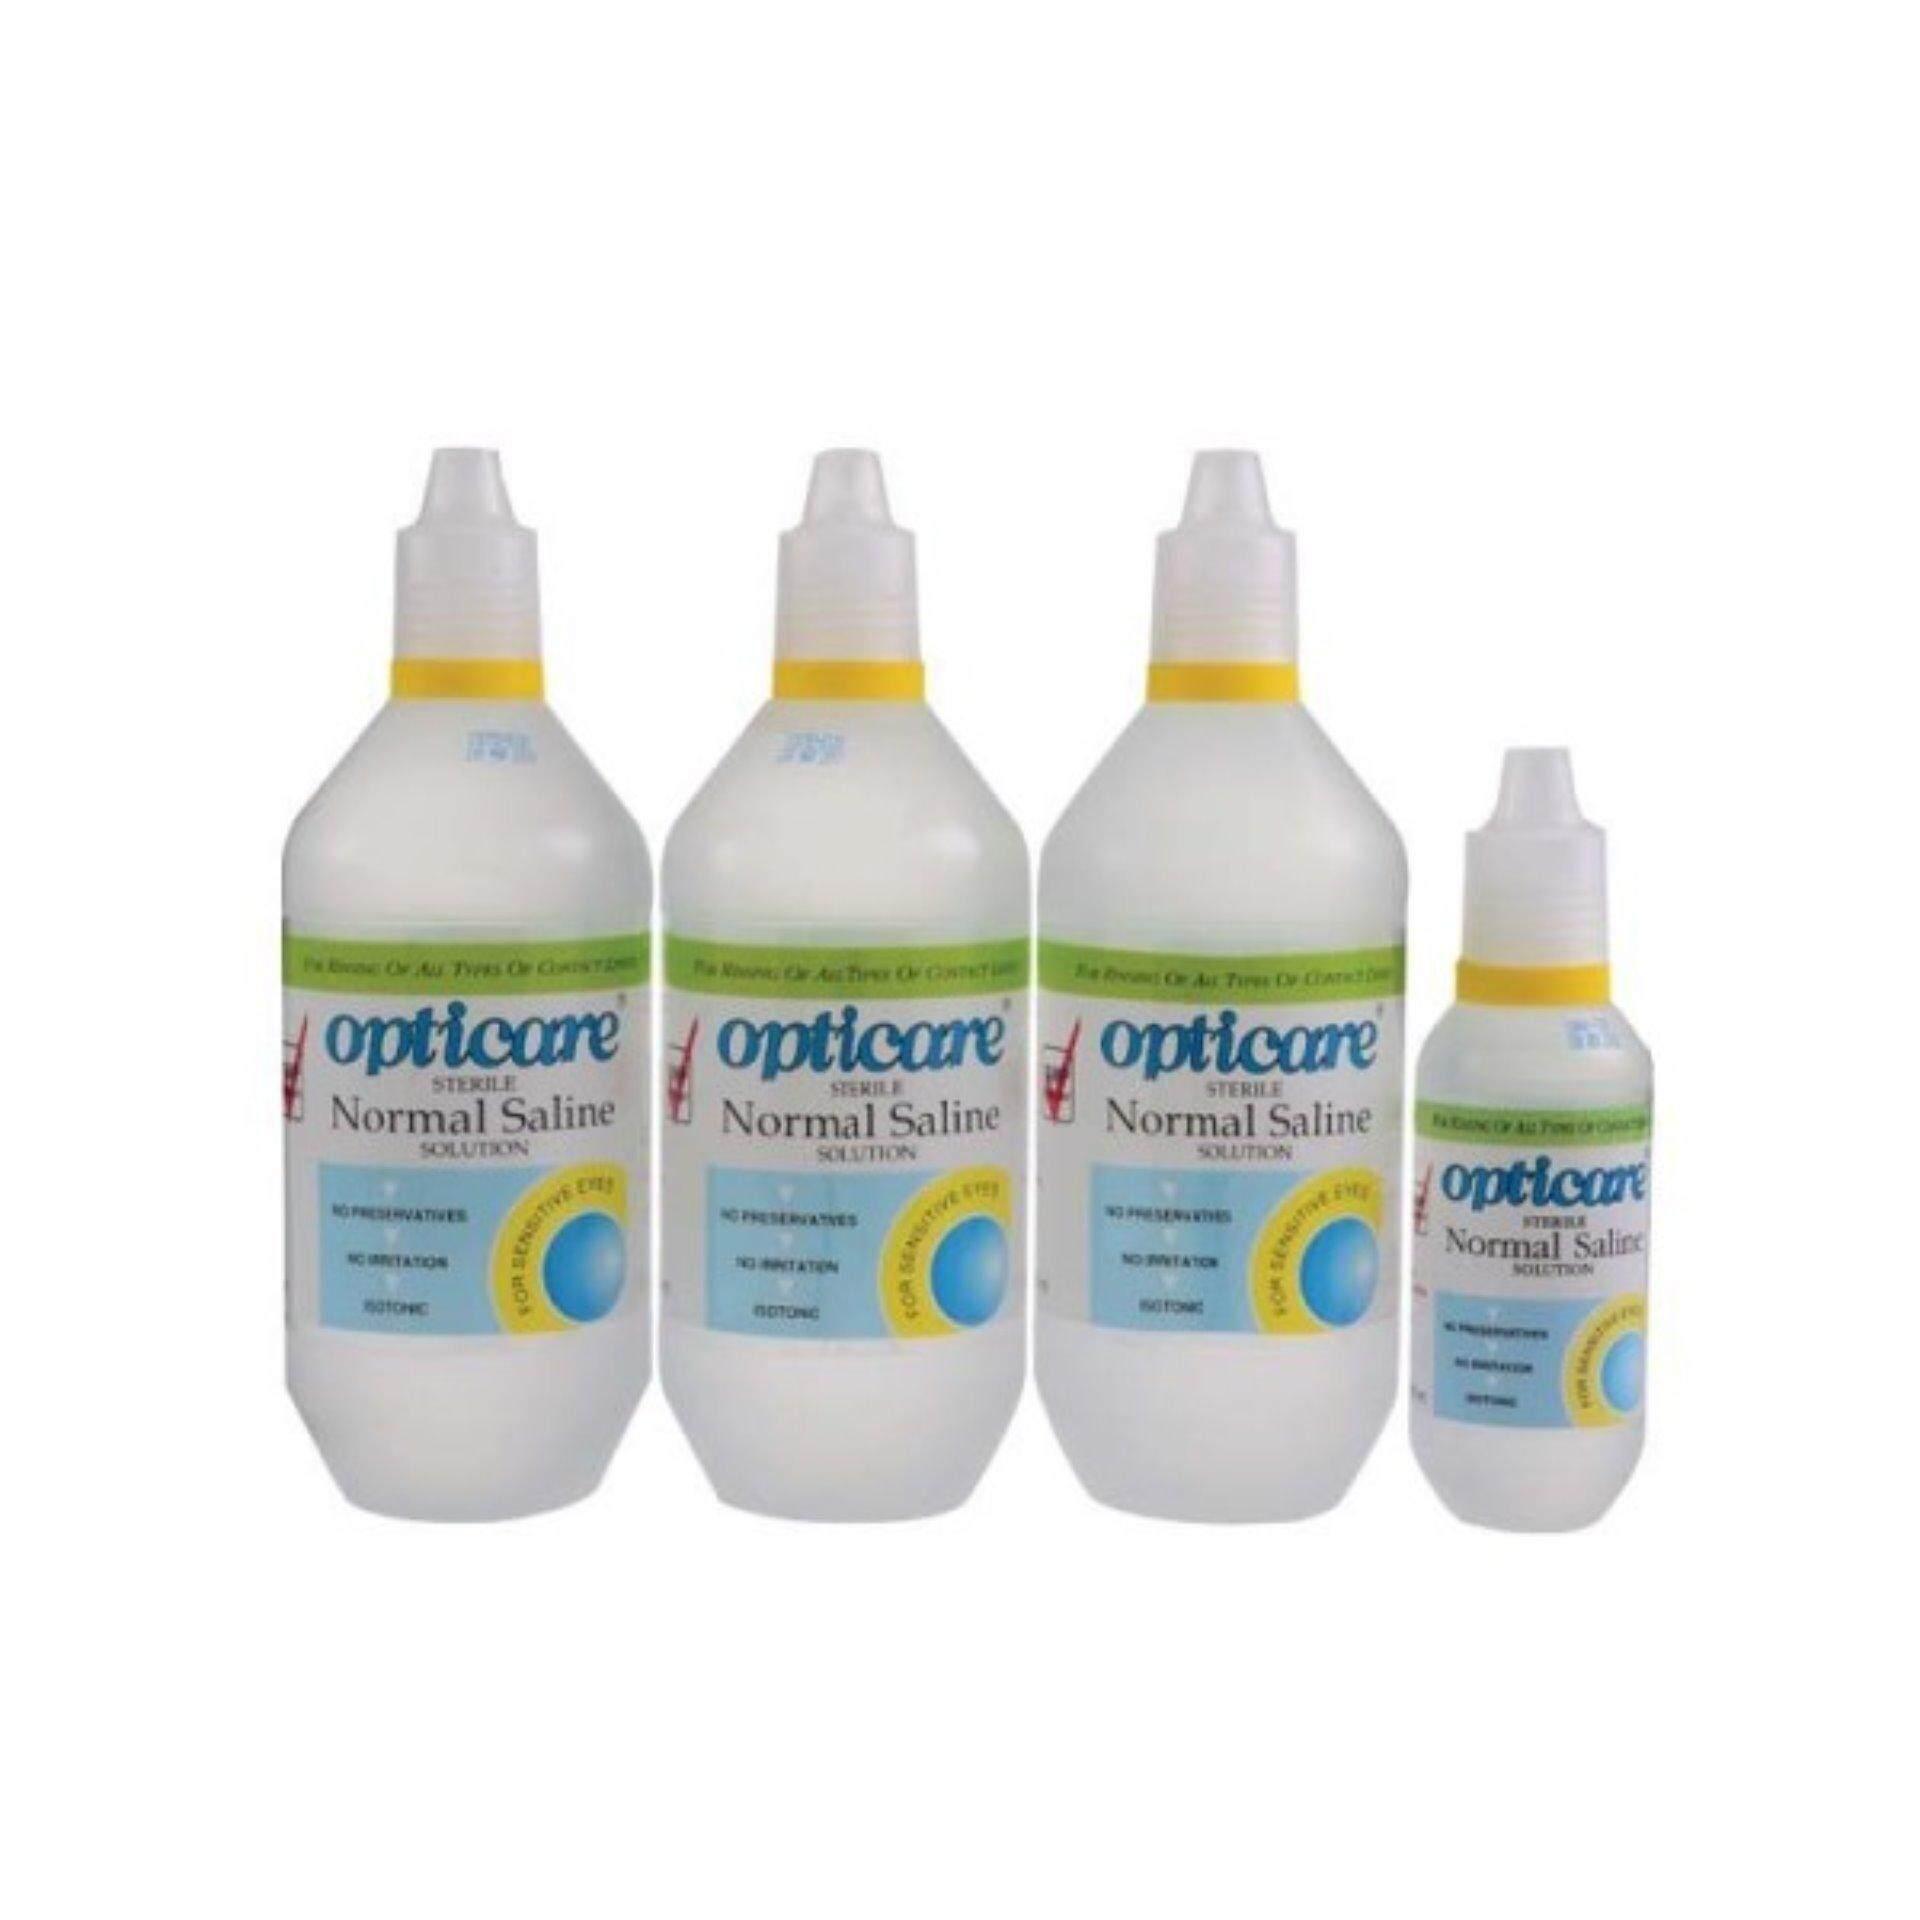 Opticare Normal Saline Solution 500mlx3 + 120mlx1